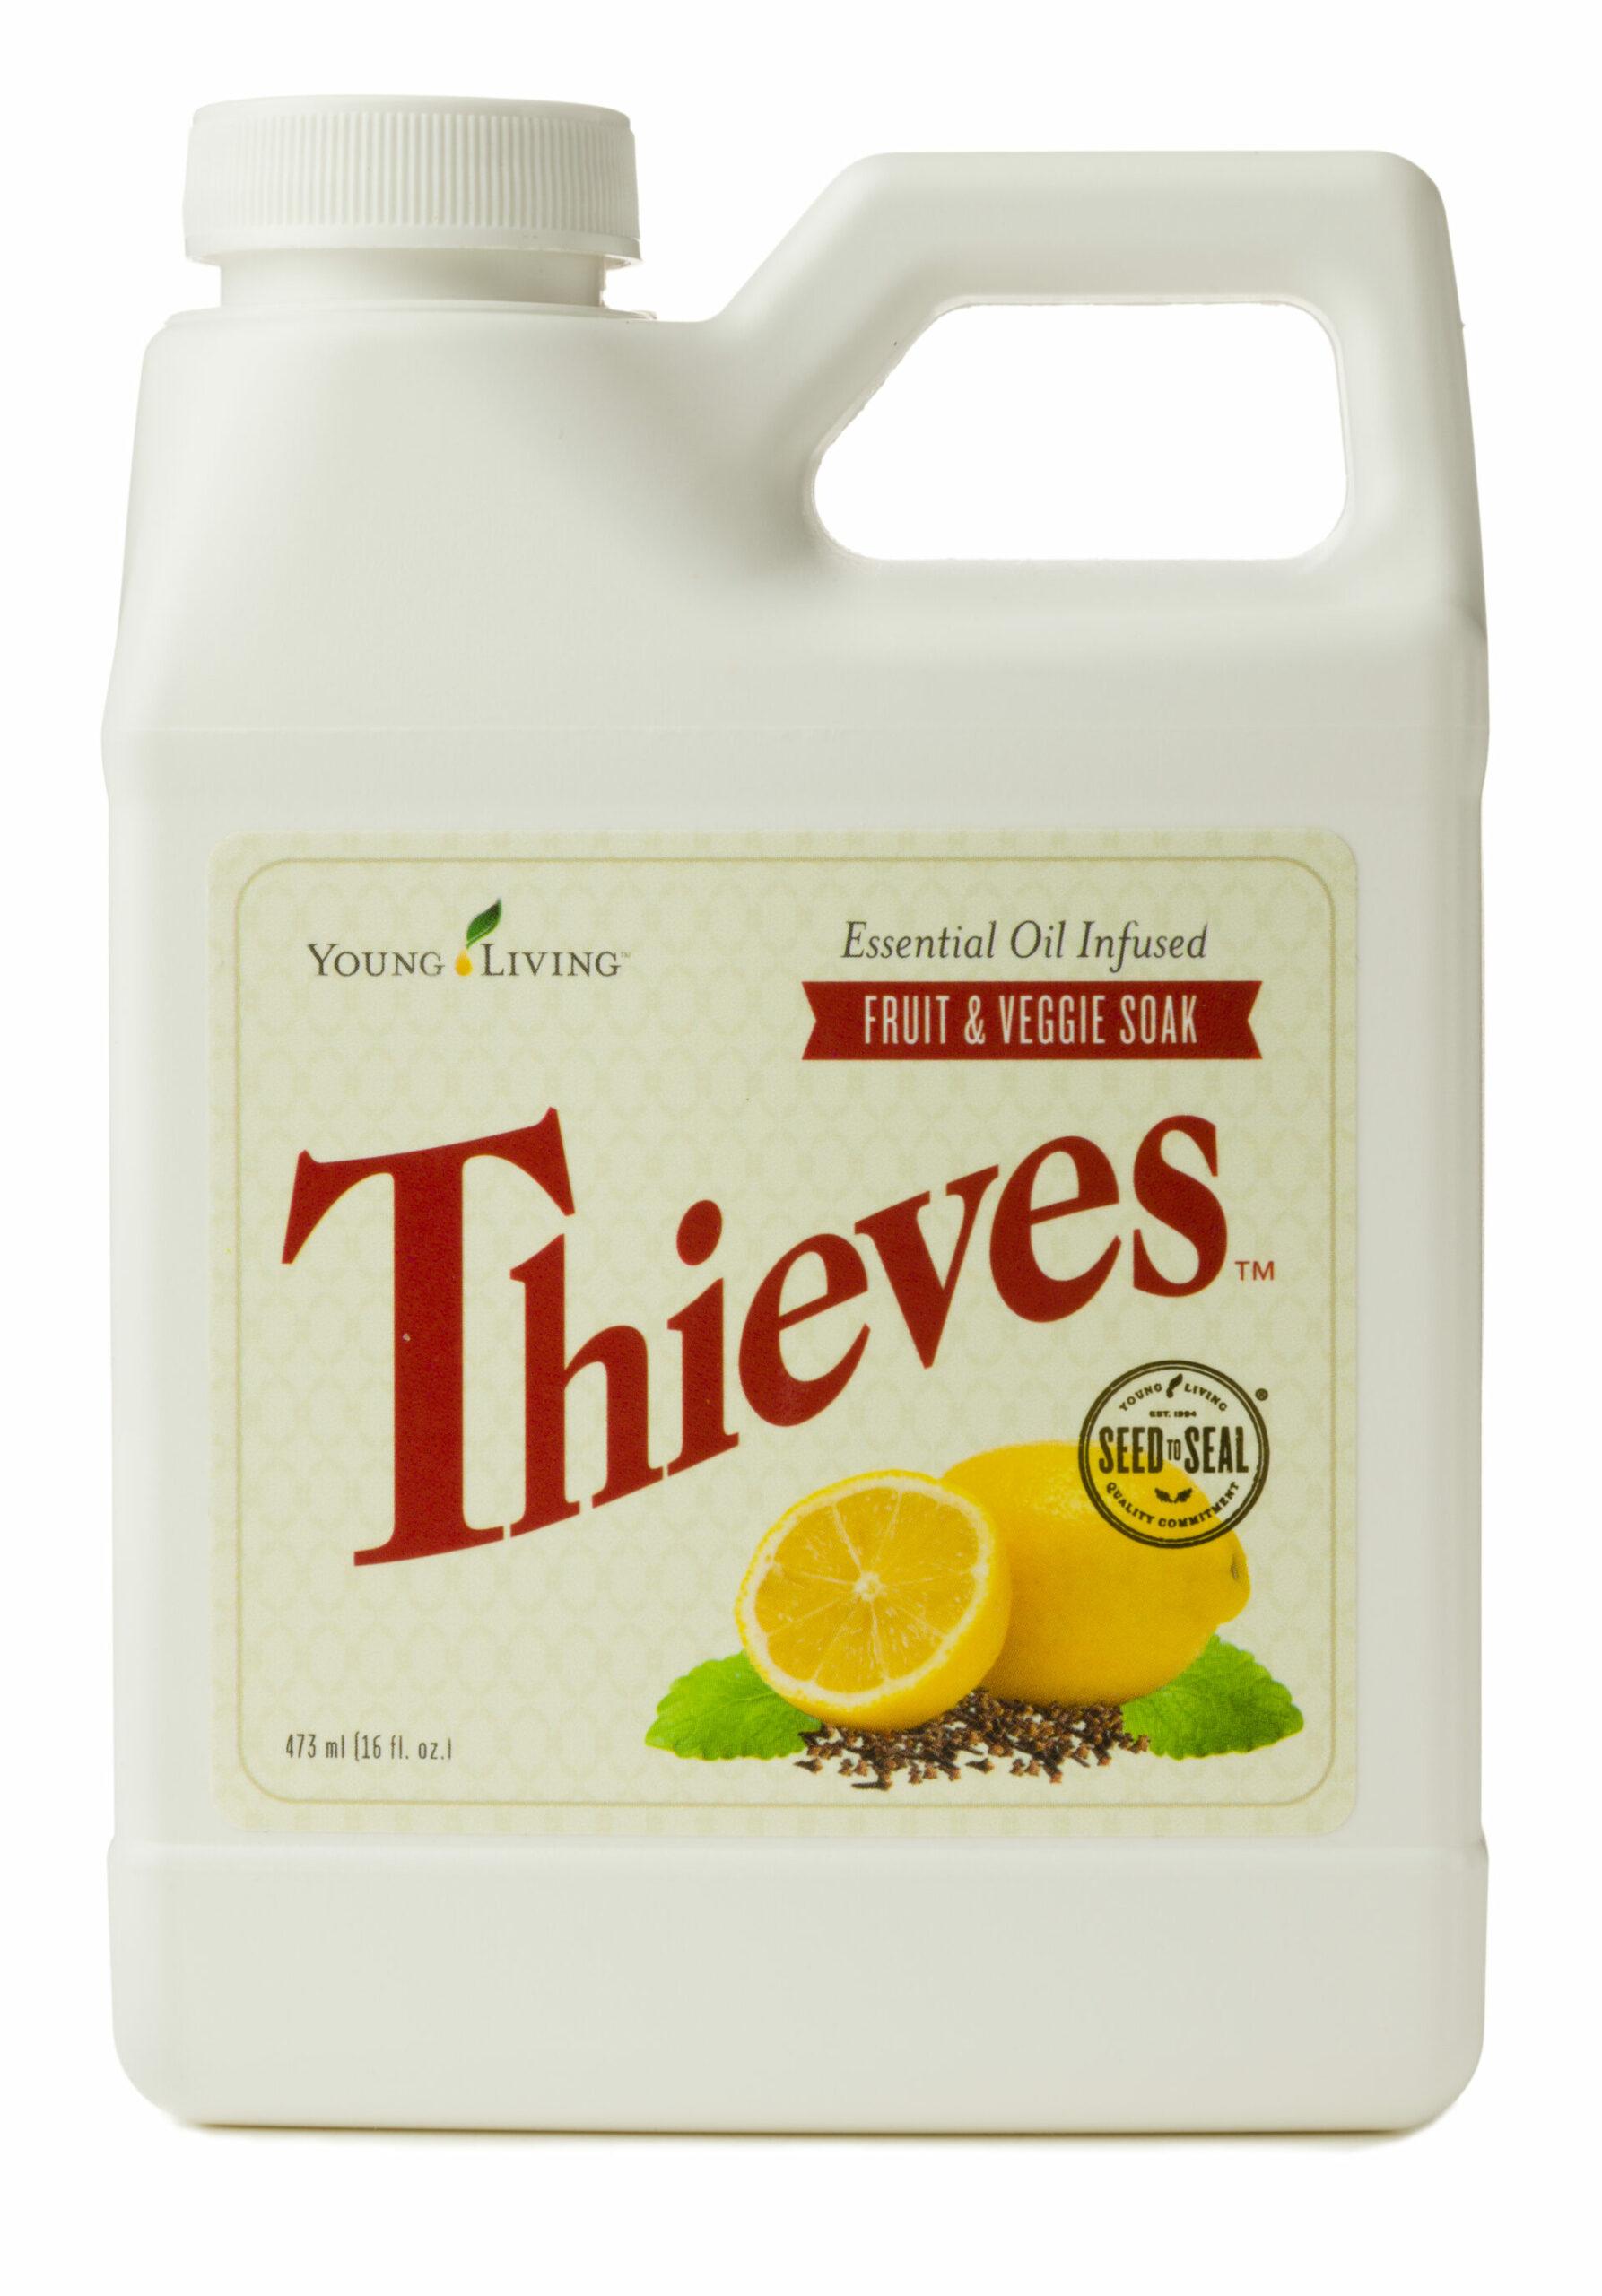 Thieves Fruit & Veggie Soak - Young Living Essential Oils